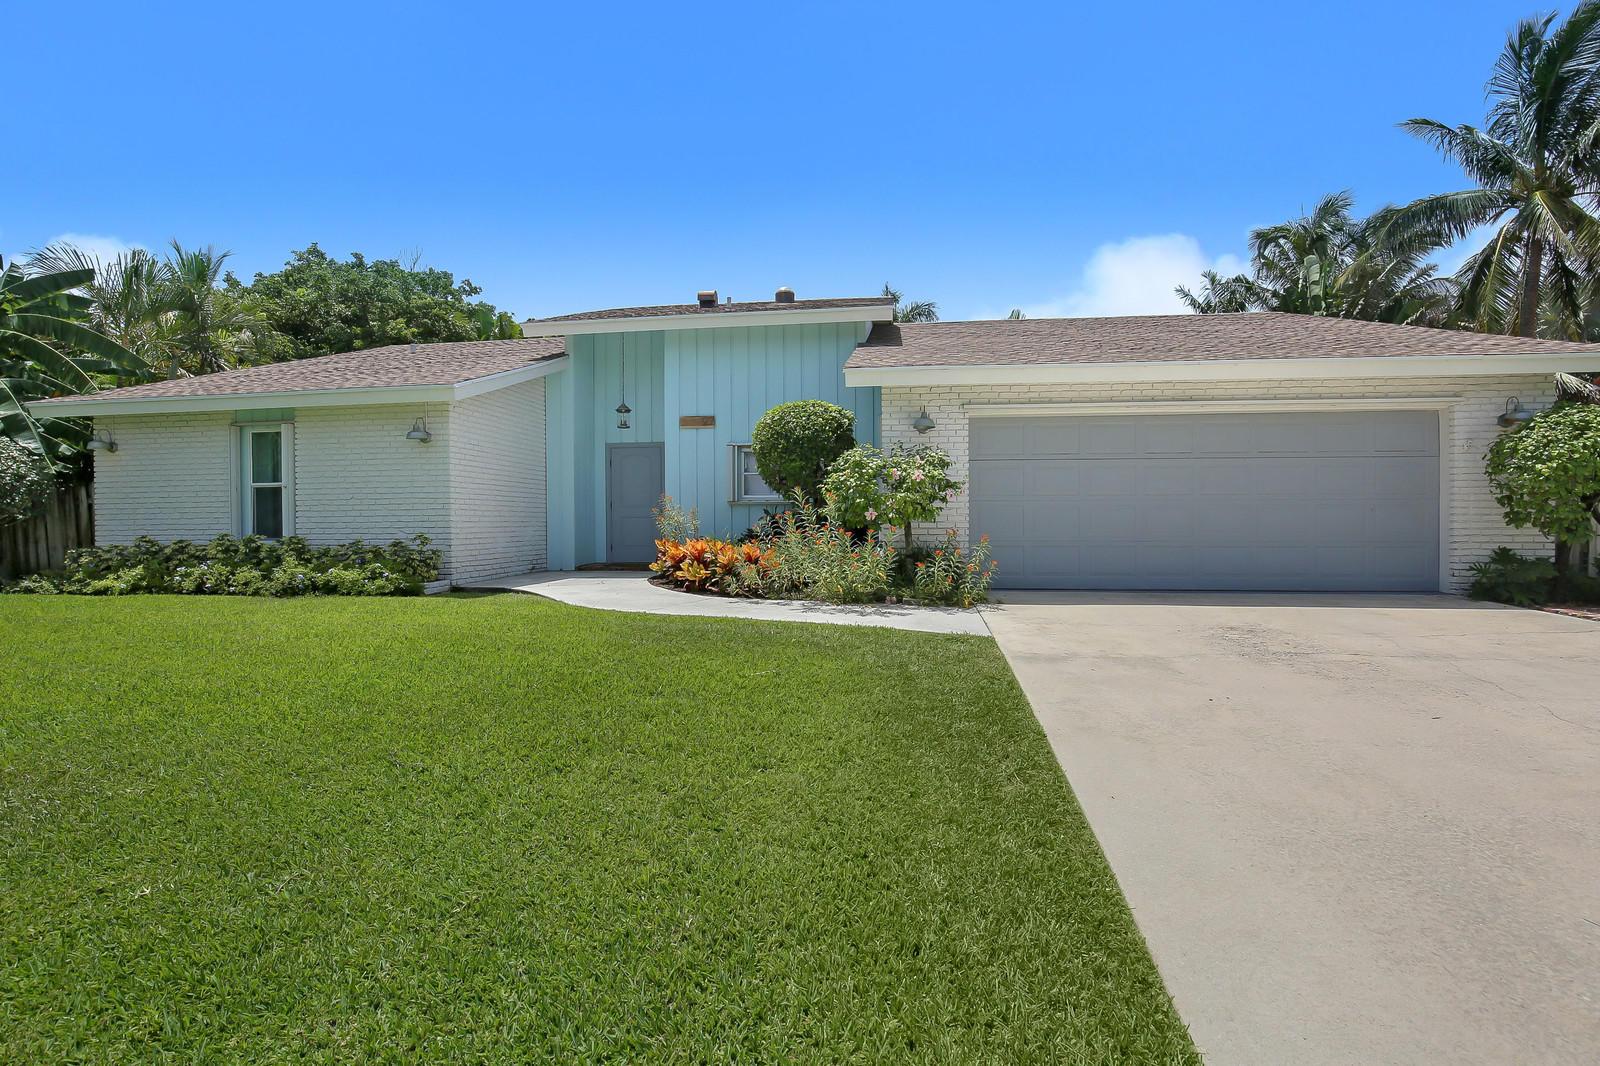 27 Harbour Drive, Ocean Ridge, Florida 33435, 2 Bedrooms Bedrooms, ,2 BathroomsBathrooms,Single Family,For Sale,Harbour,RX-10455457